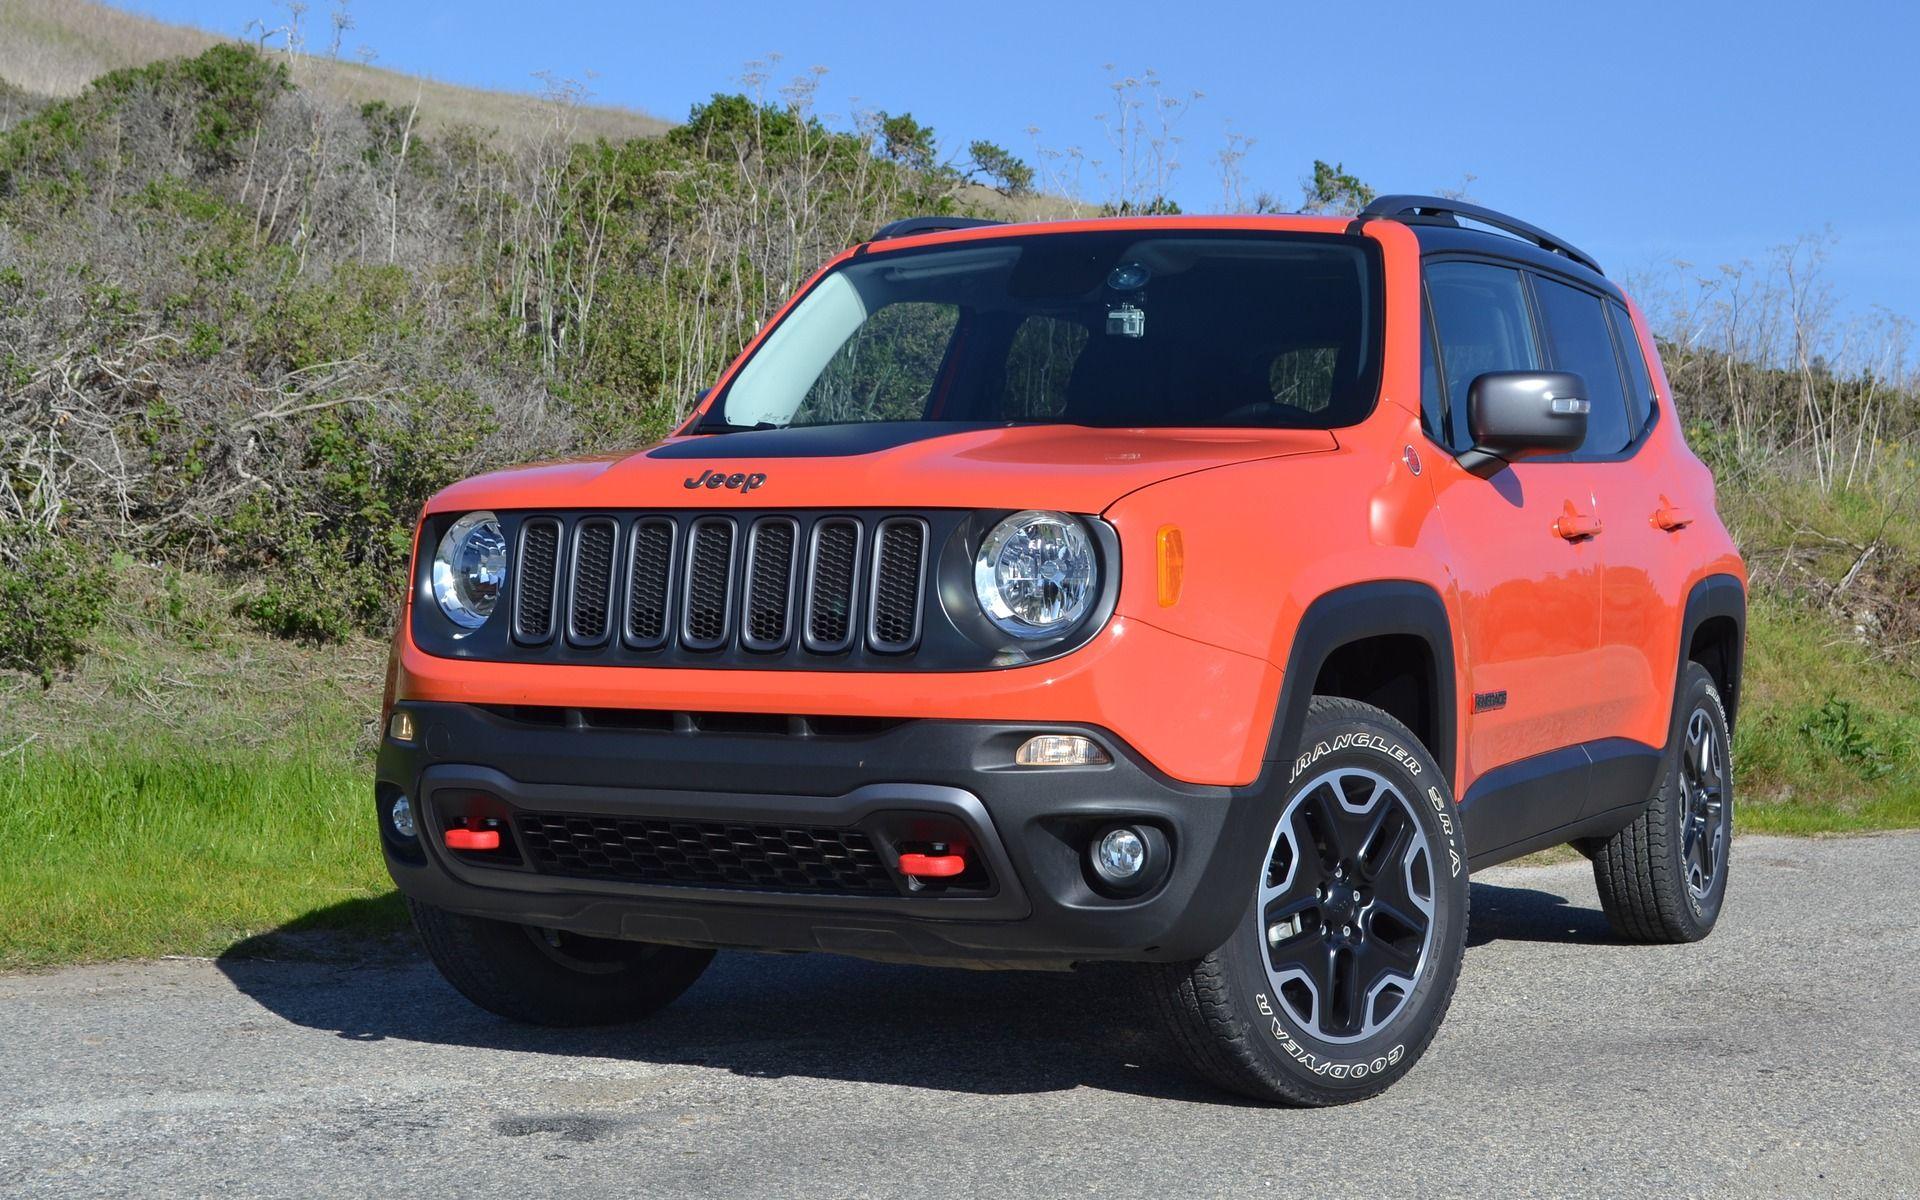 Pin By Scott Brawley On Jeep Jeep Jeep Renegade 2015 Jeep Renegade Orange Jeep